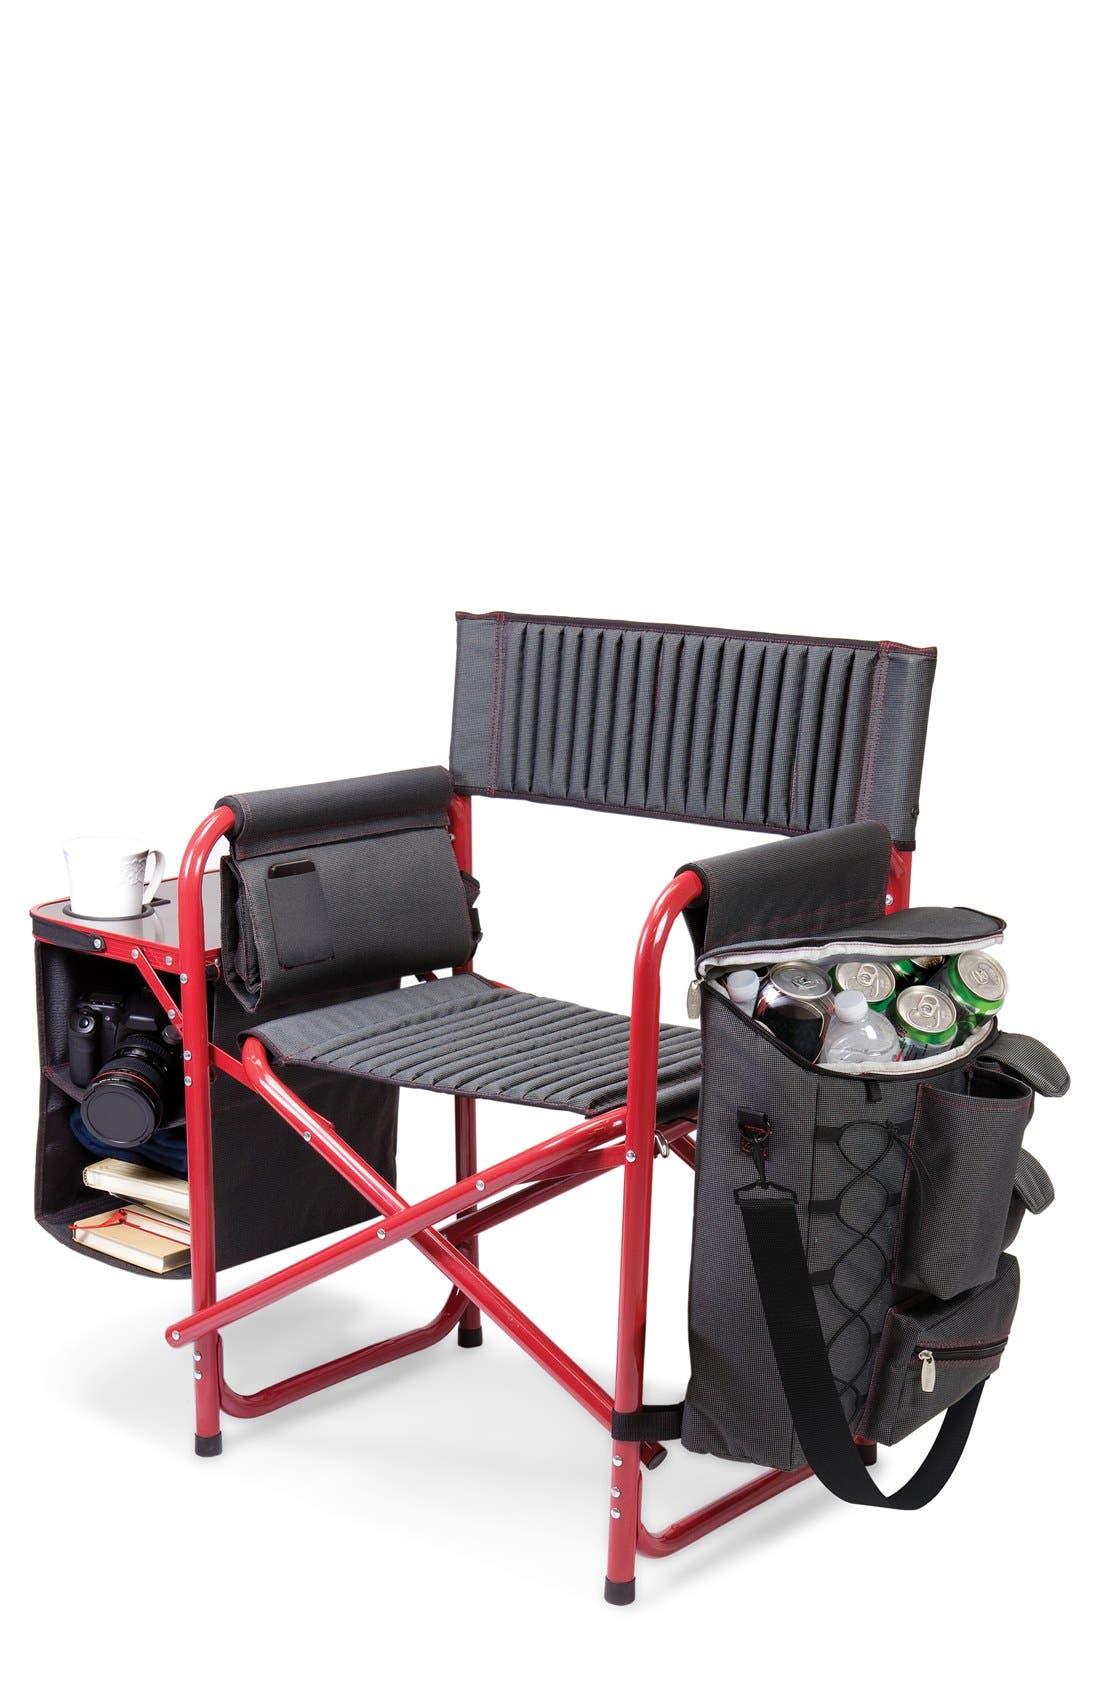 Picnic Time 'Fusion' Lawn Chair